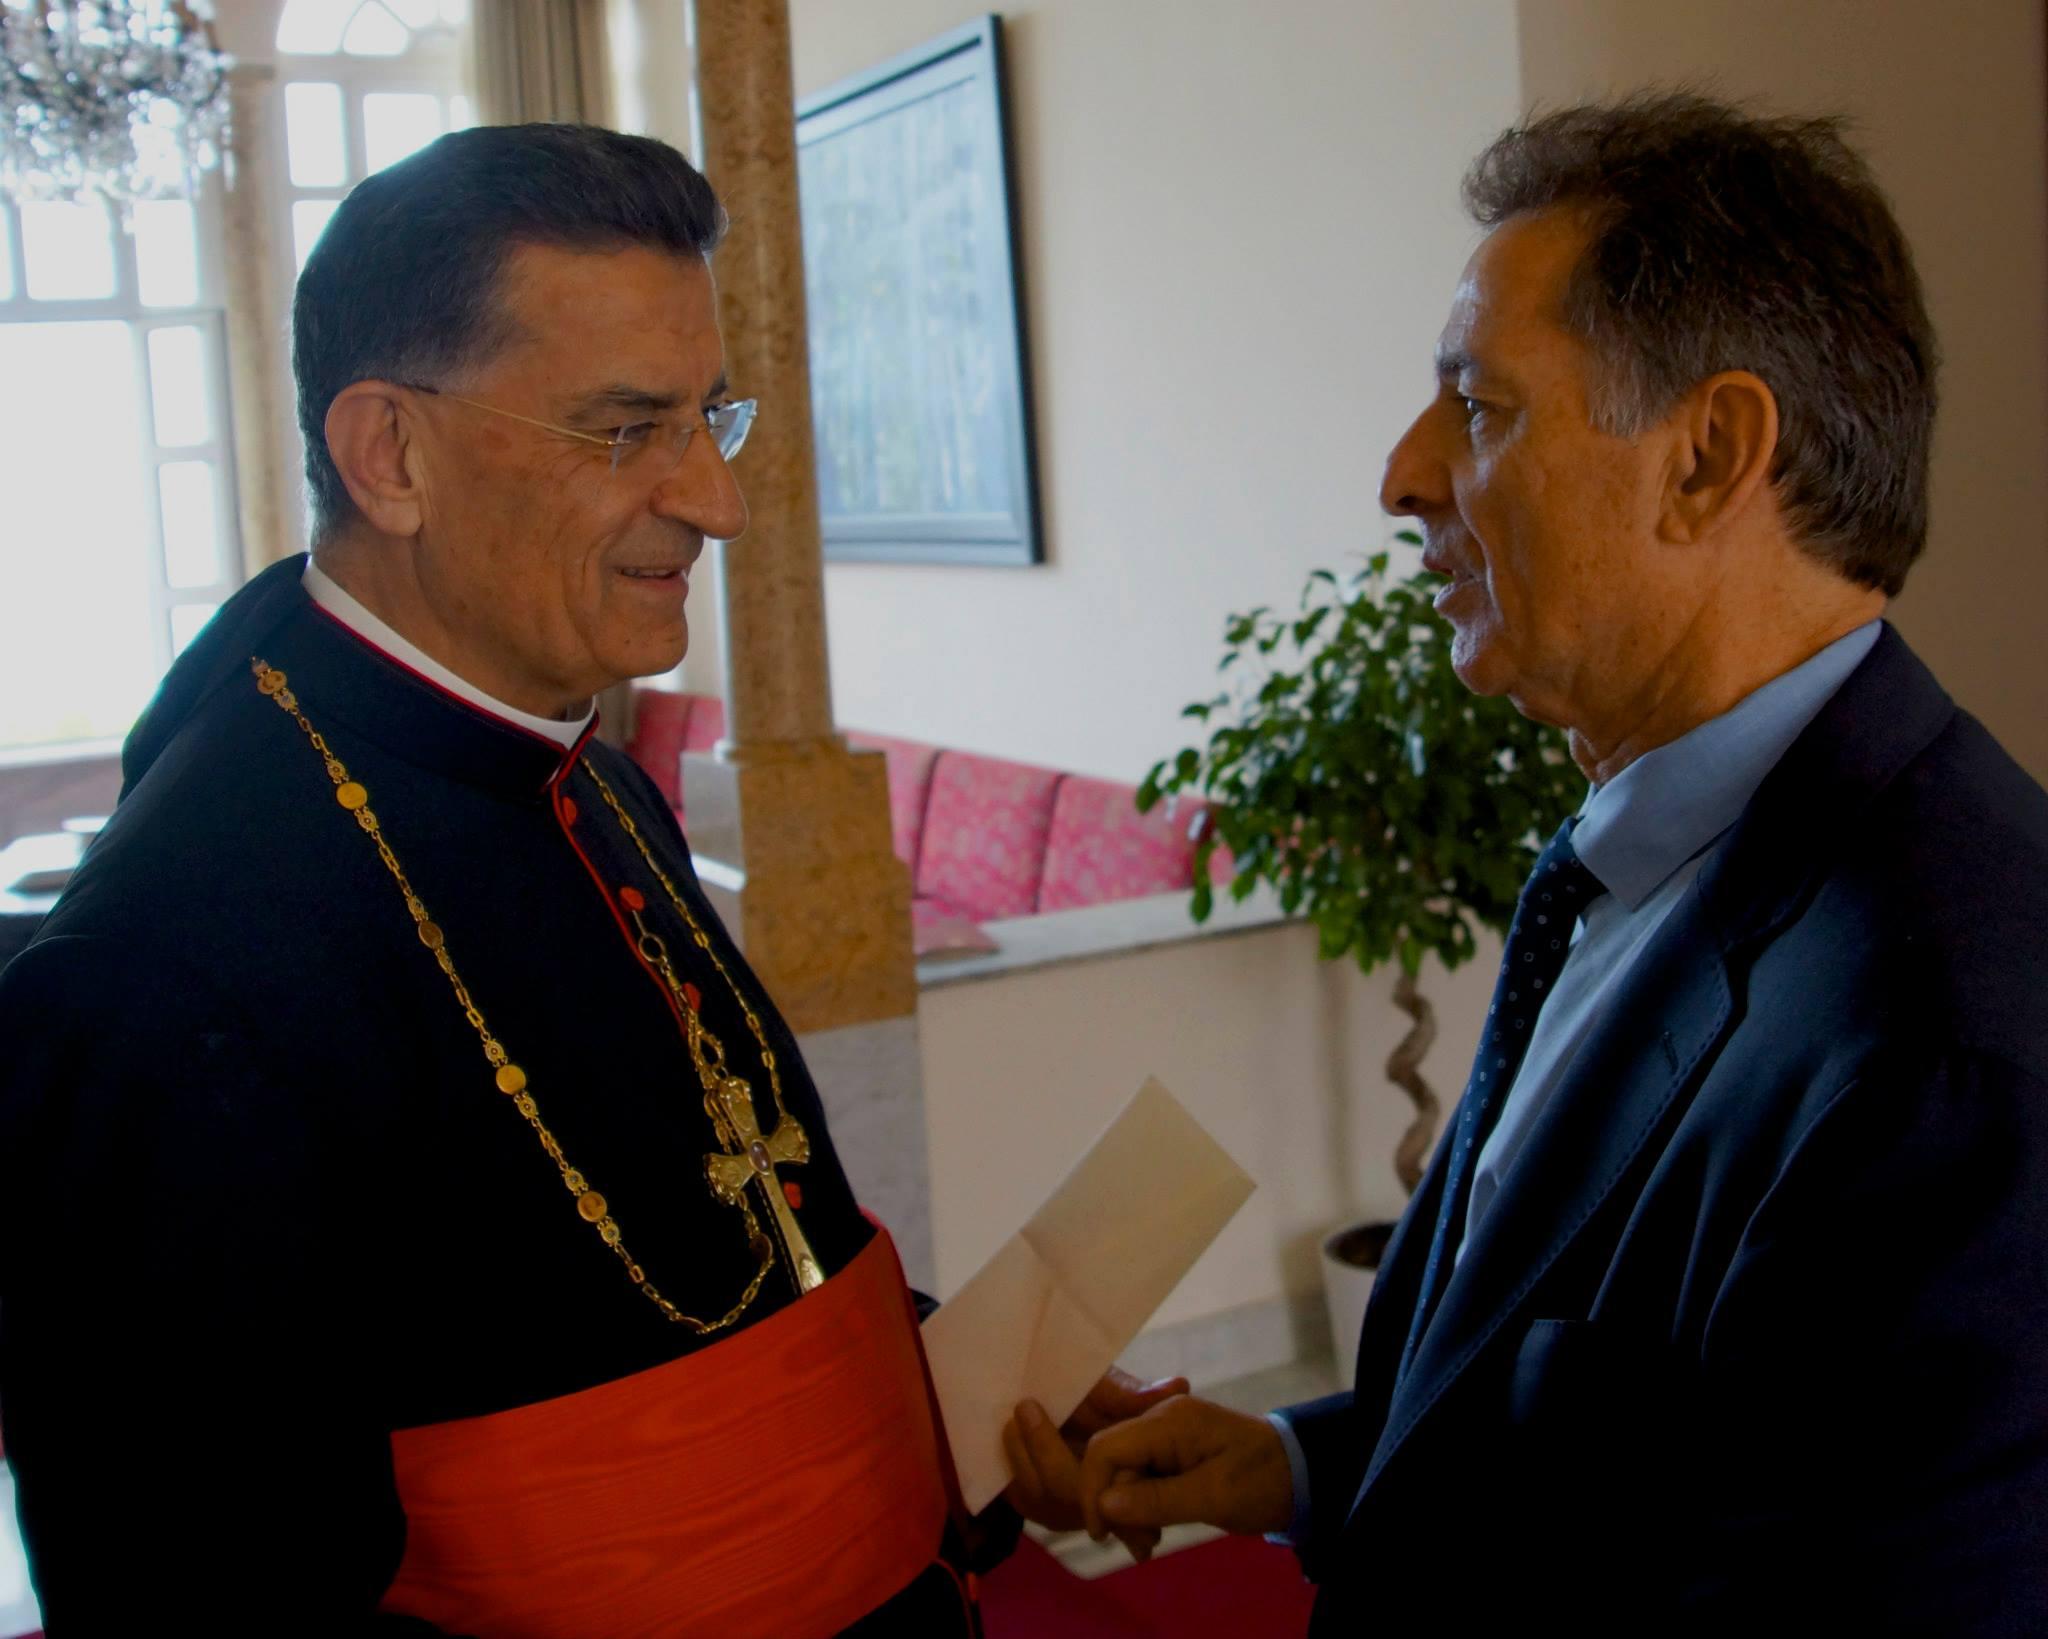 Meeting at Patriarch Bechara al Rahi Resideance in Lebanon